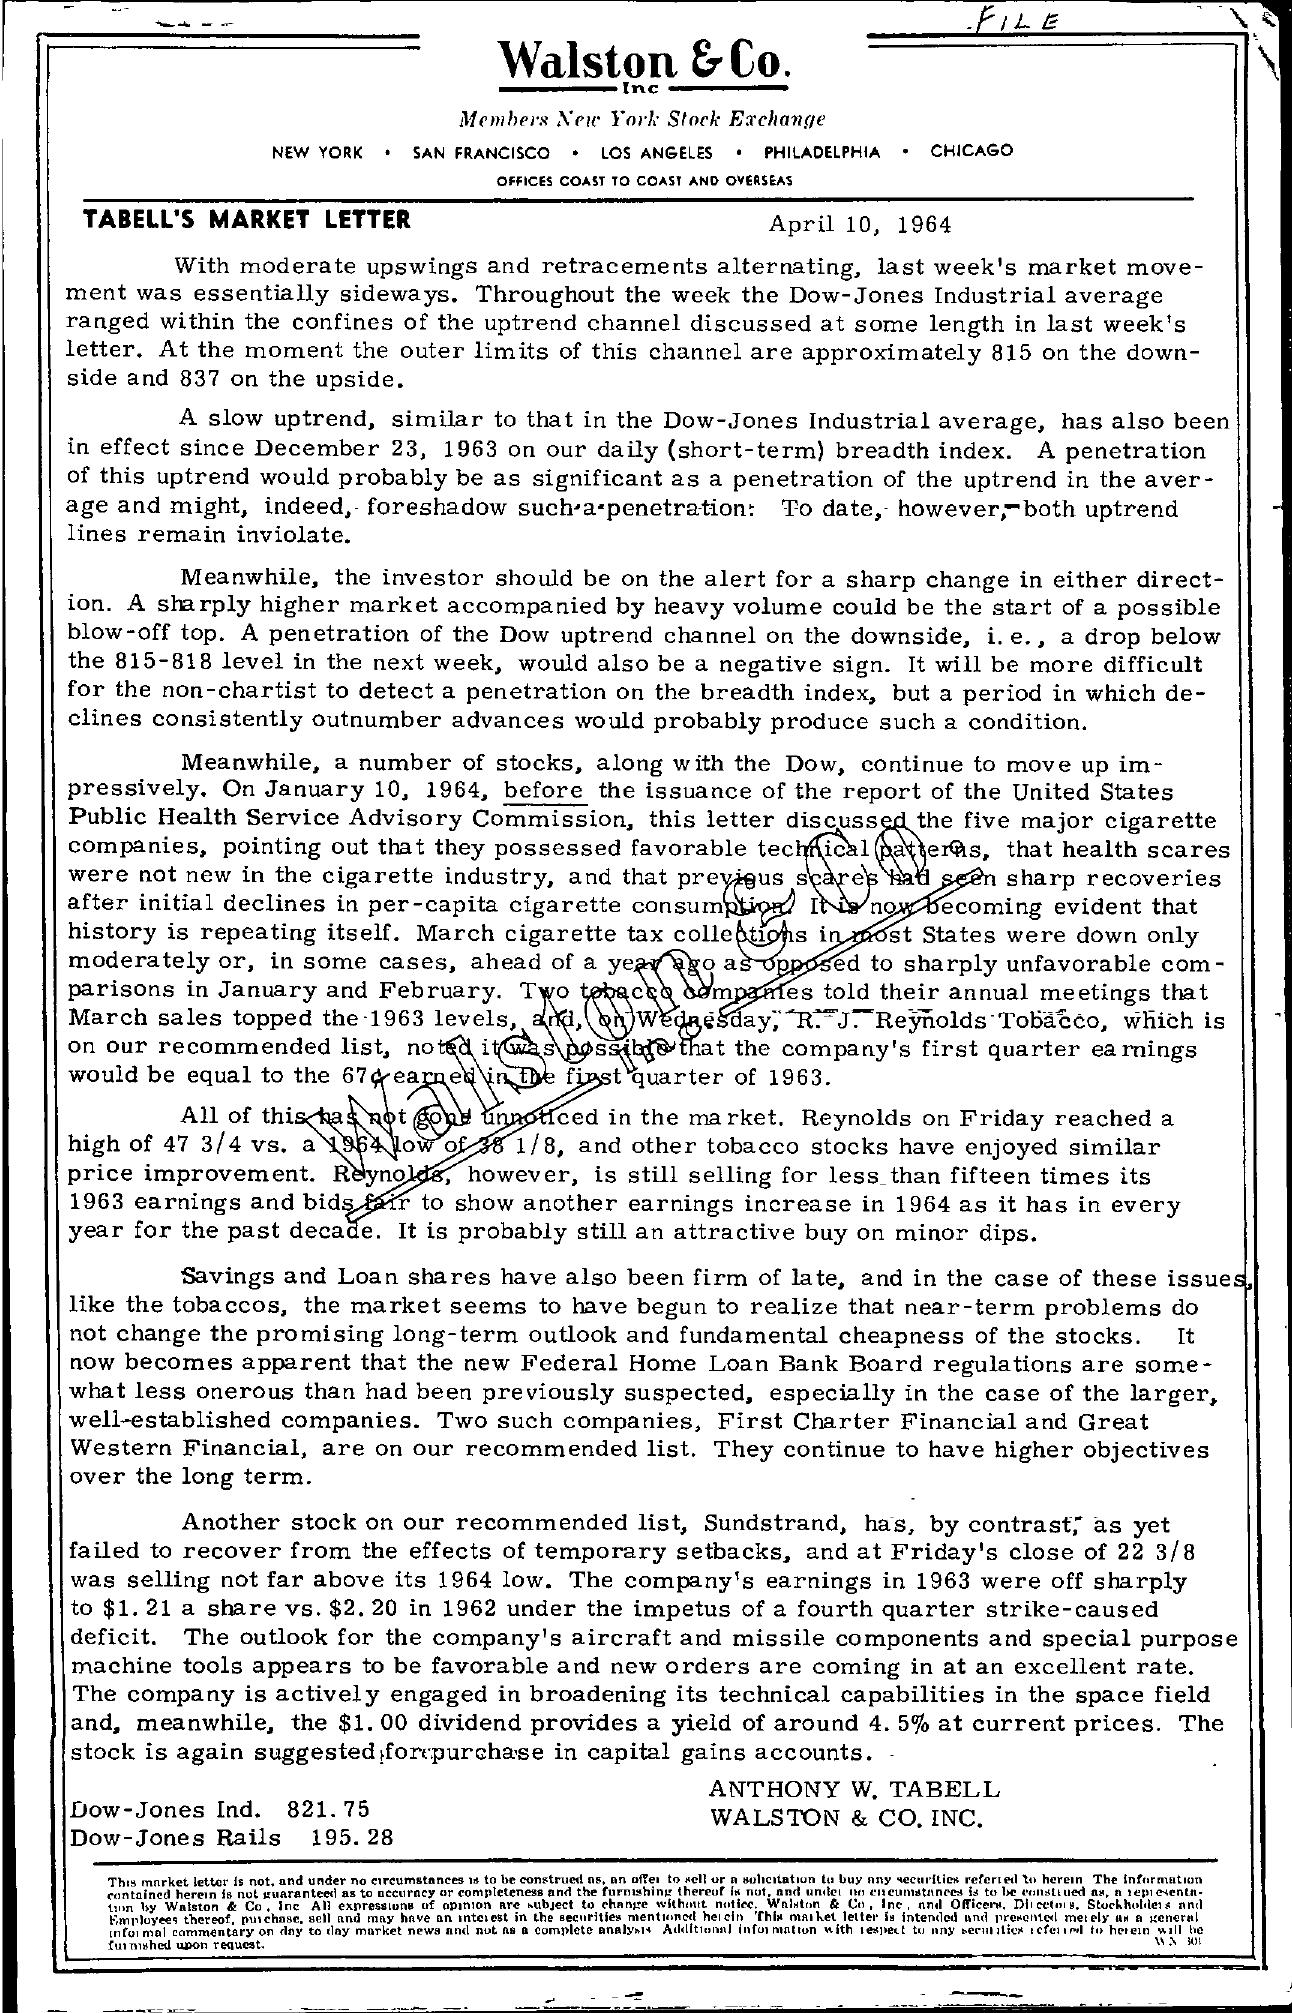 Tabell's Market Letter - April 10, 1964